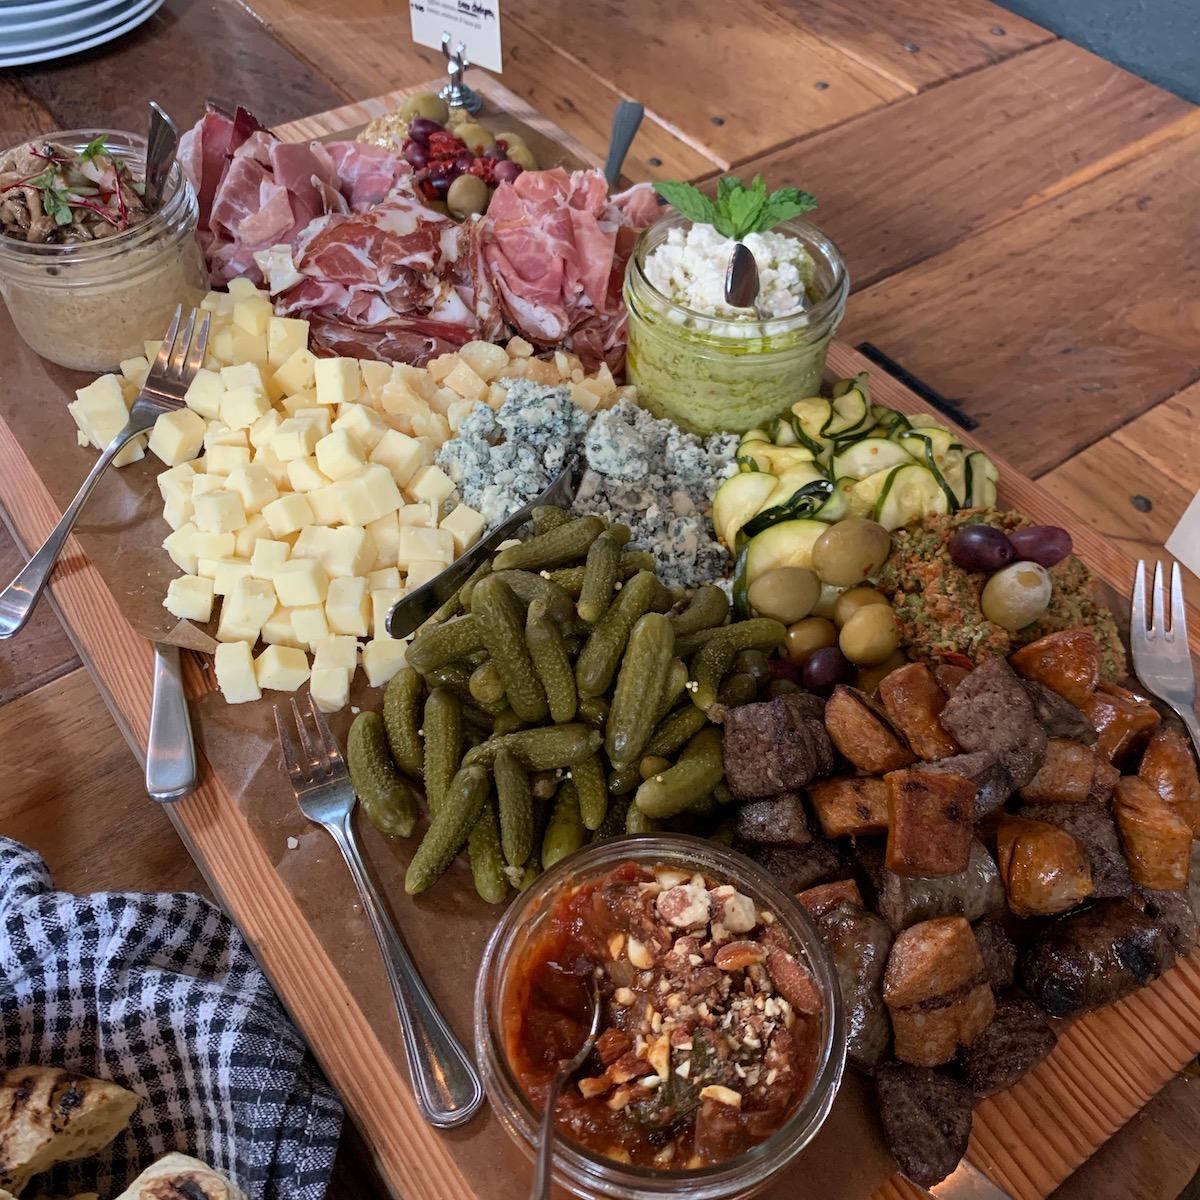 Dine Railtown has officially started on November 1st until November 30